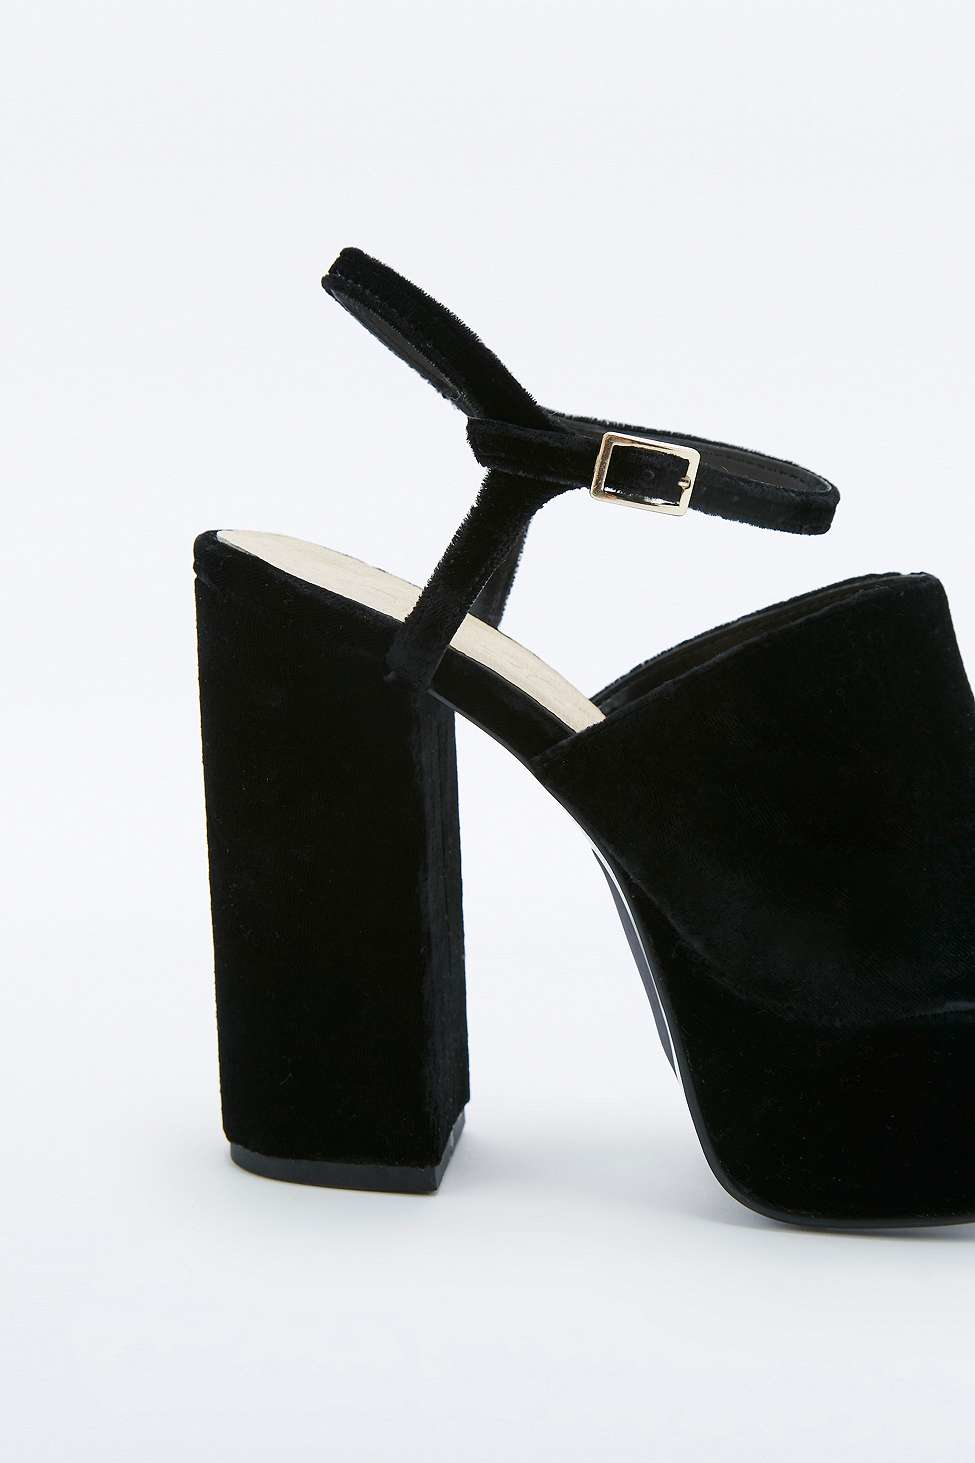 c21b524977d Urban Outfitters Phoebe Black Velvet Platform Shoes in Black - Lyst